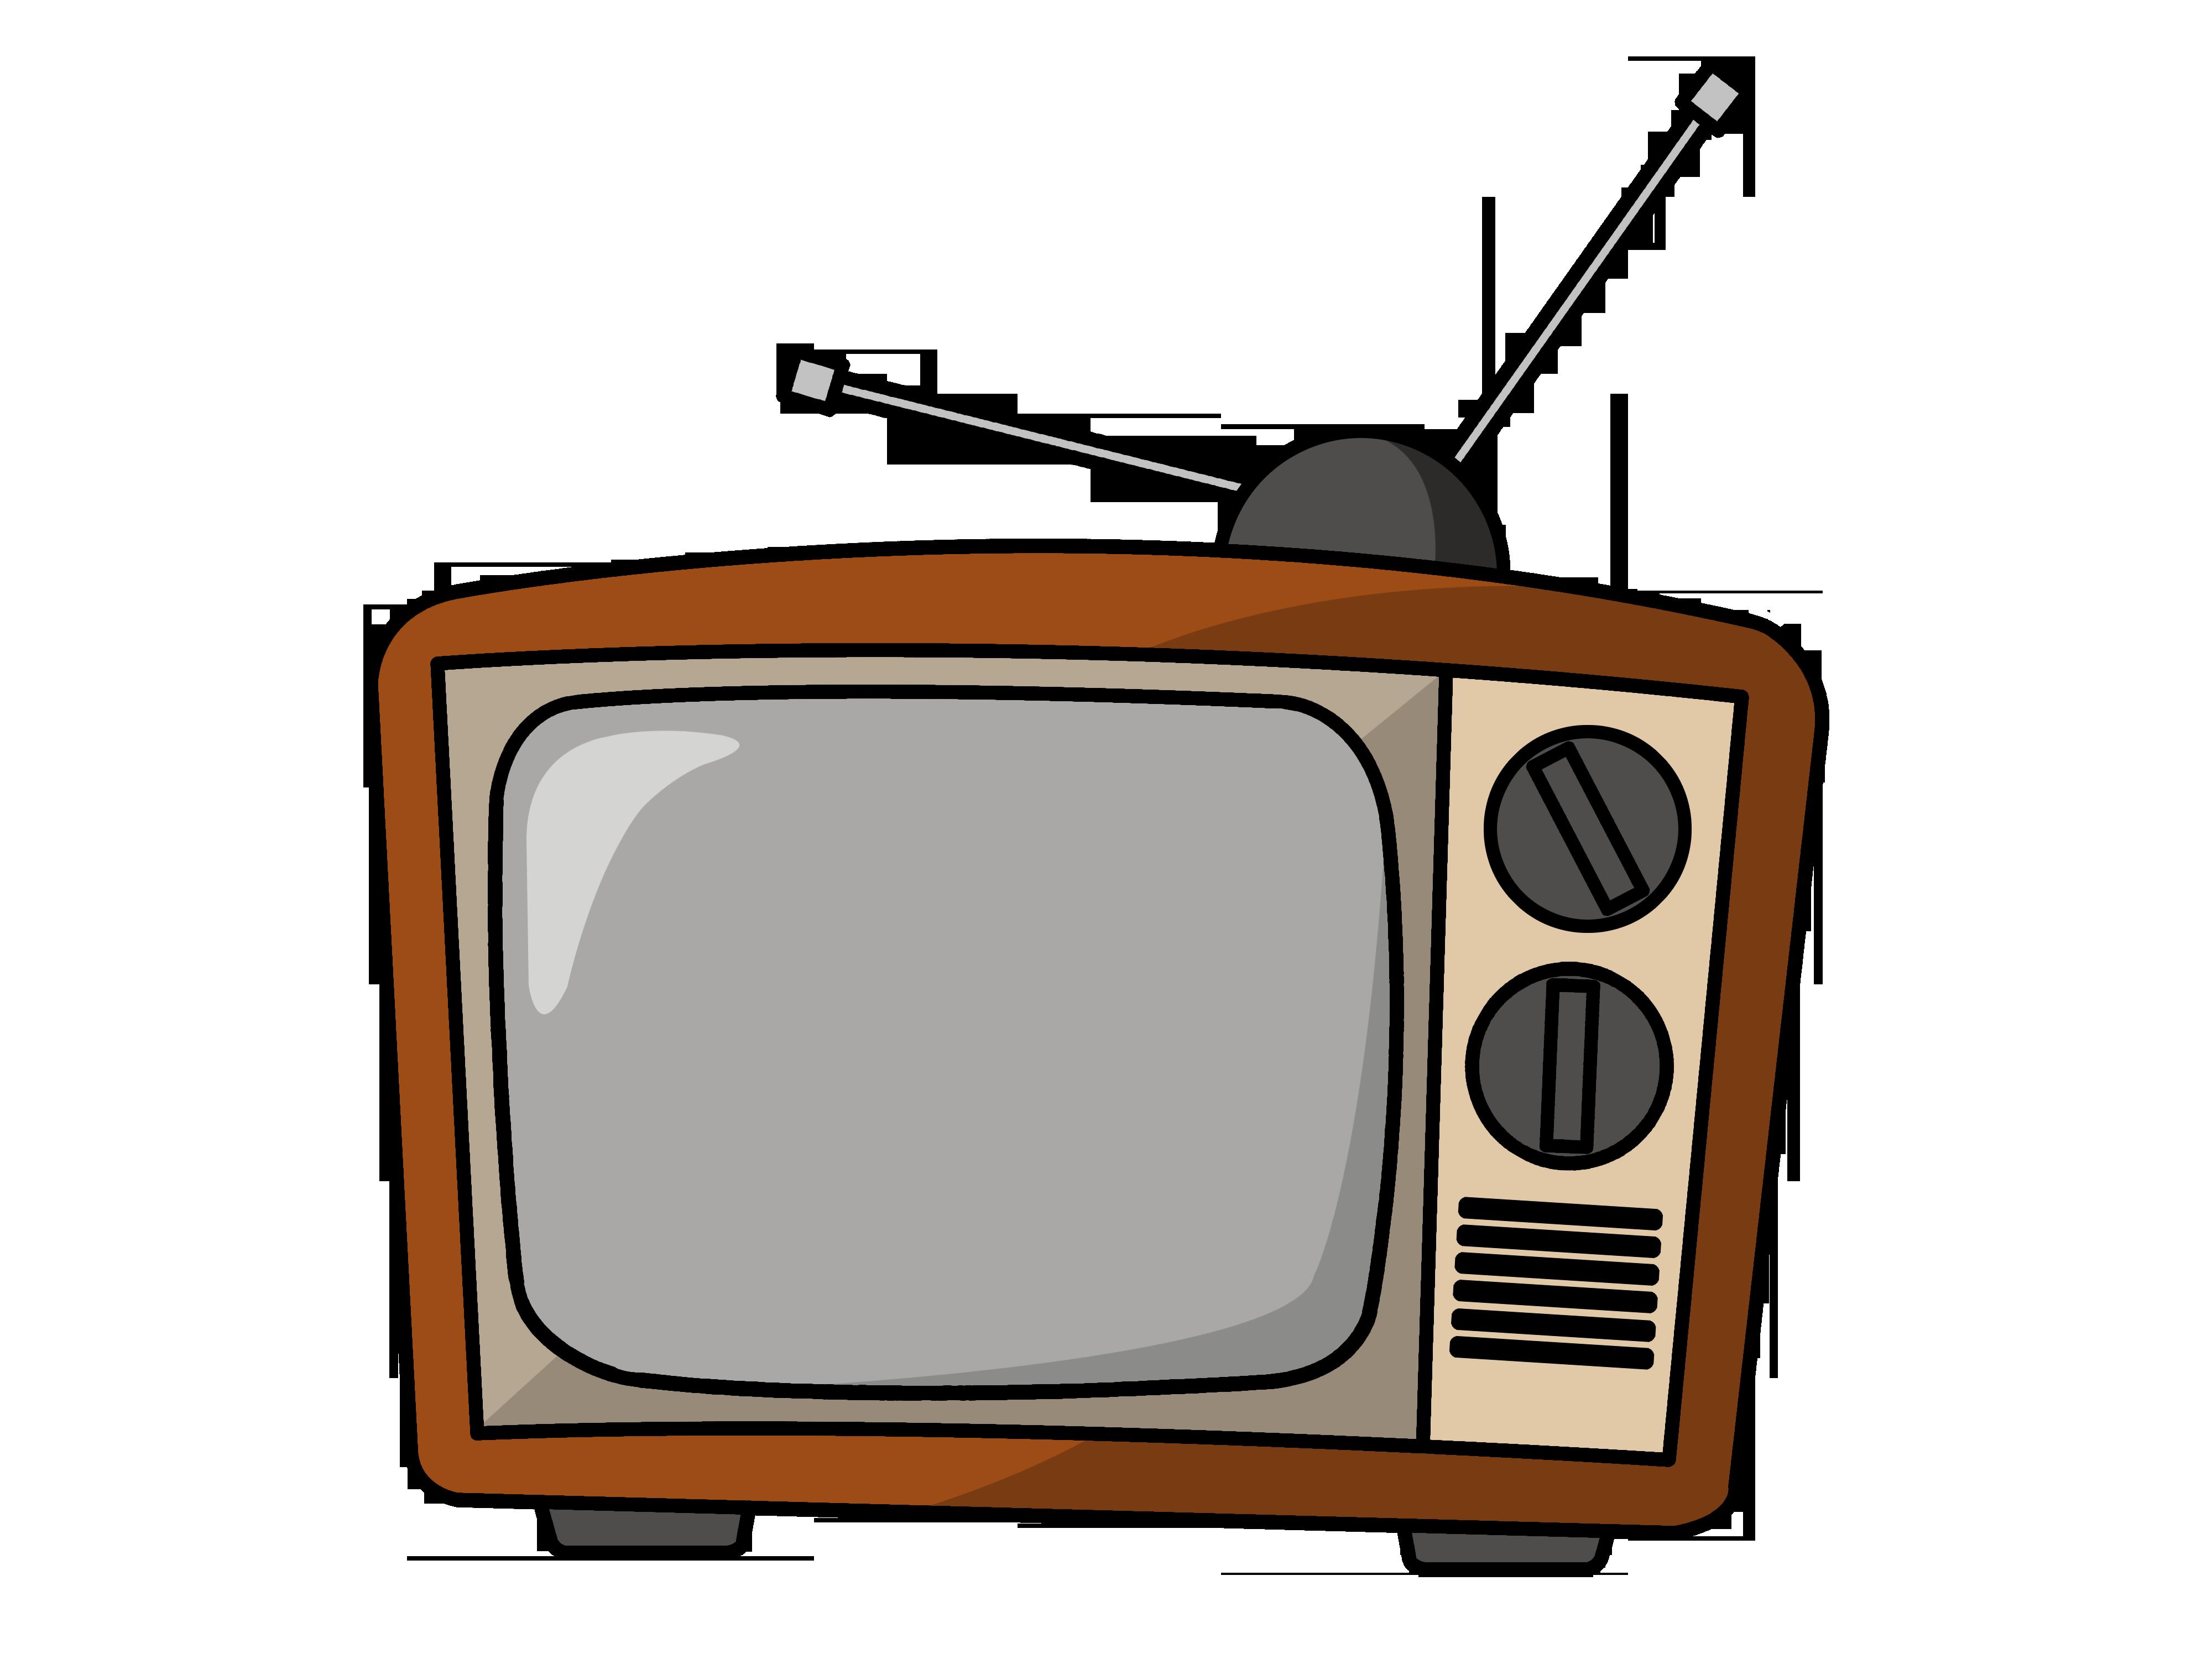 tv clipart television10 maties marketing244 rh matiesmarketing244 com clip art tv broadcast tv set clipart